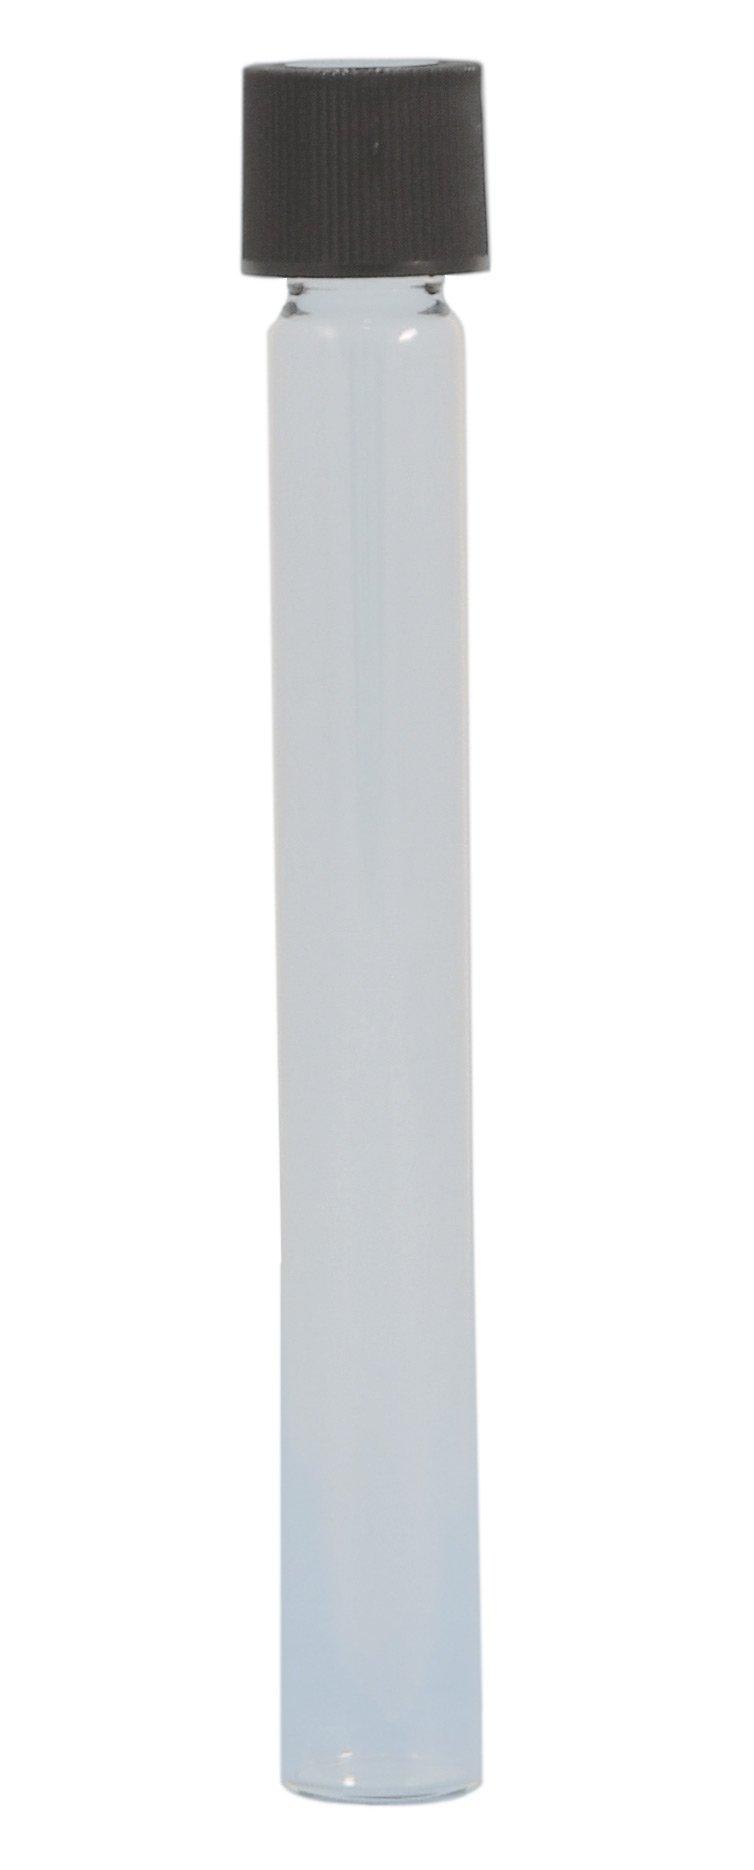 Tube, Glass, with Polypropylene Screw Cap, Empty, 16x125mm, 1000 per Box, by Comar Glass